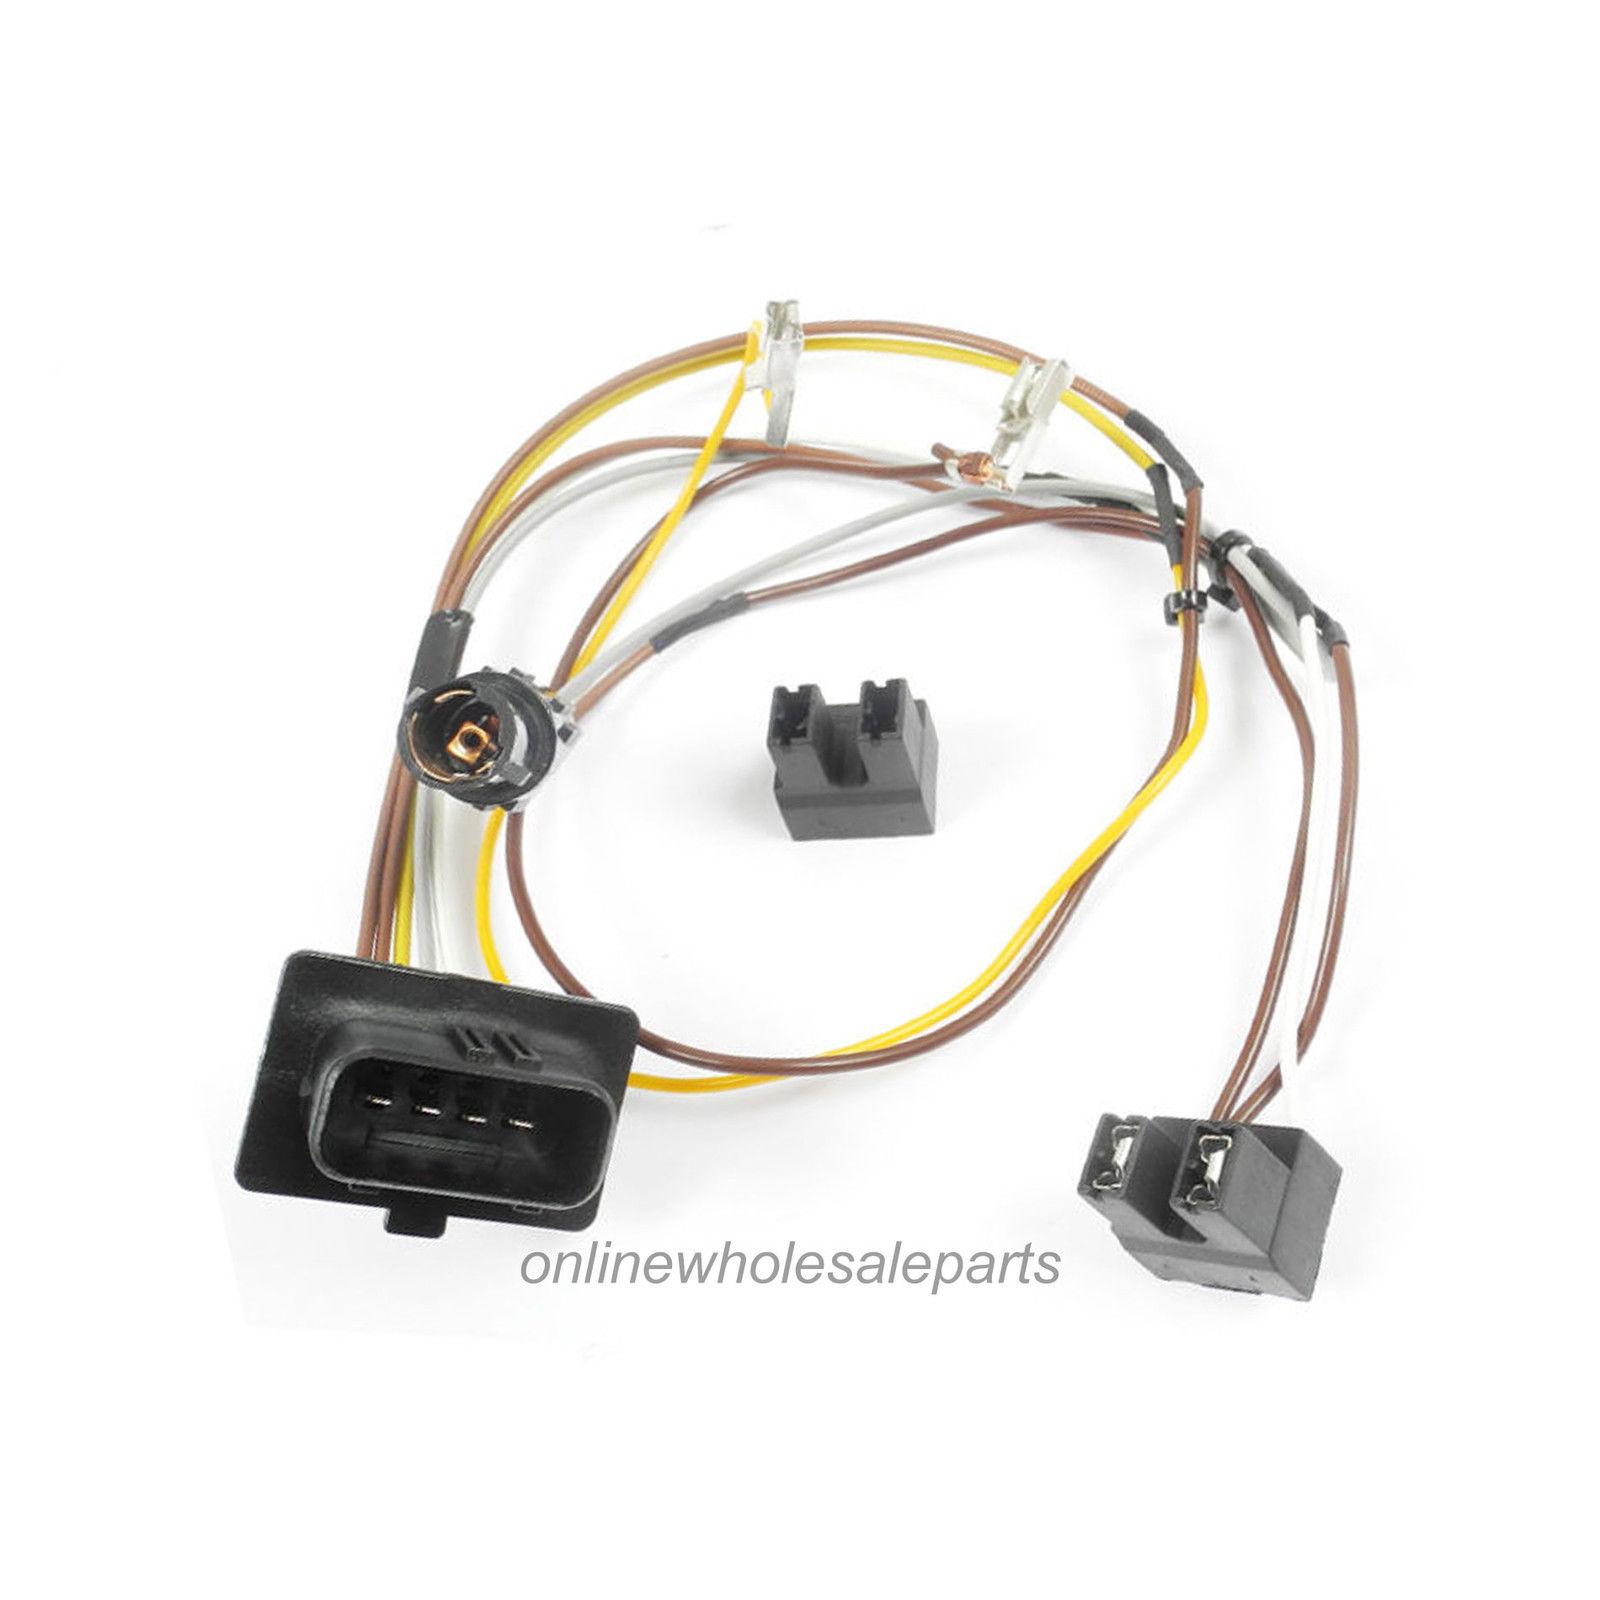 Headlight Wire Harness Repair Kit B760 For Mercedes Benz CLK320 CLK350  CLK430   eBayeBay